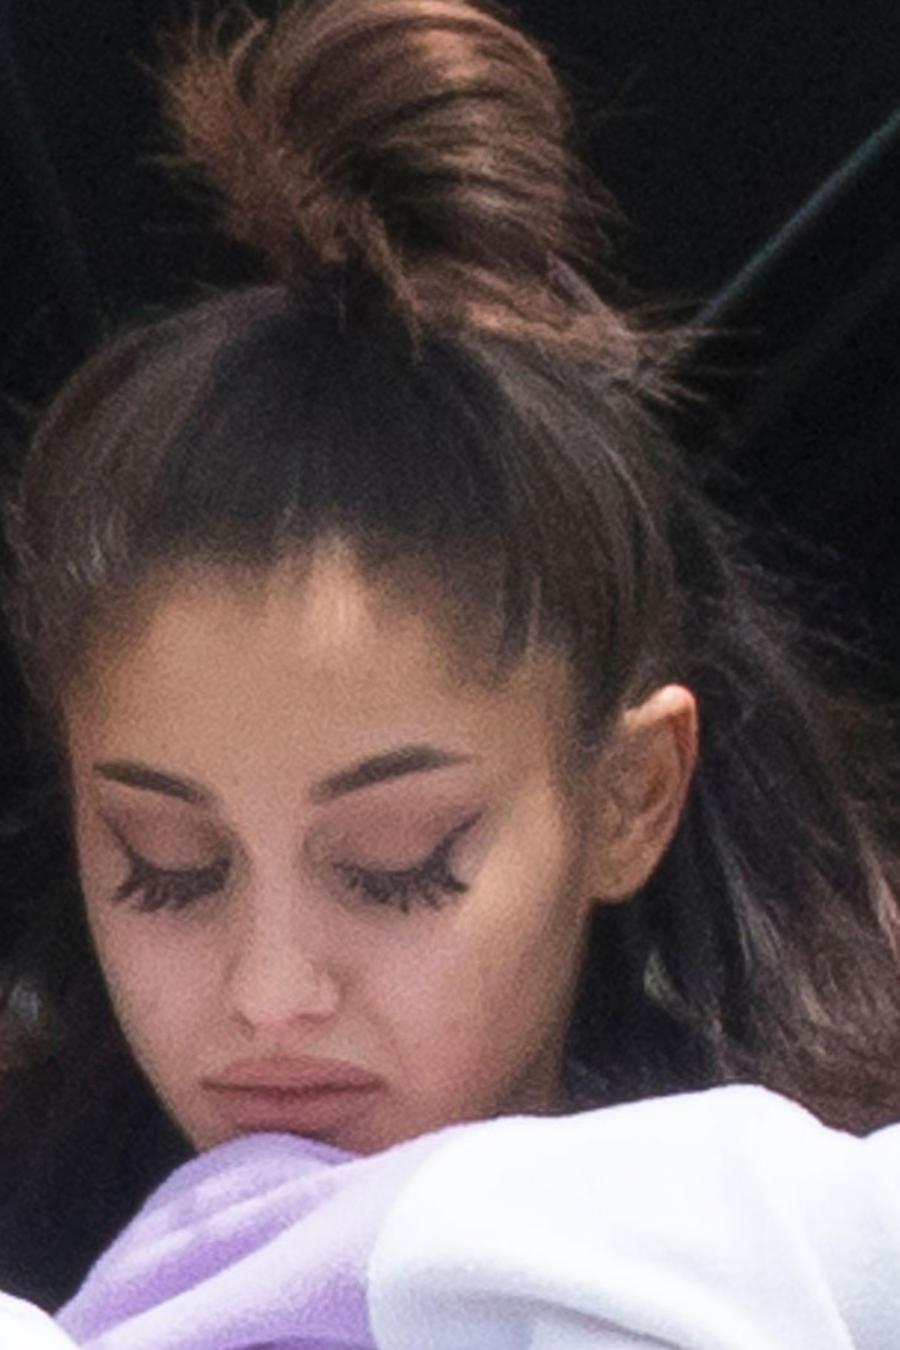 Un padre de tres fans de Ariana Grande le escribió una emotiva carta